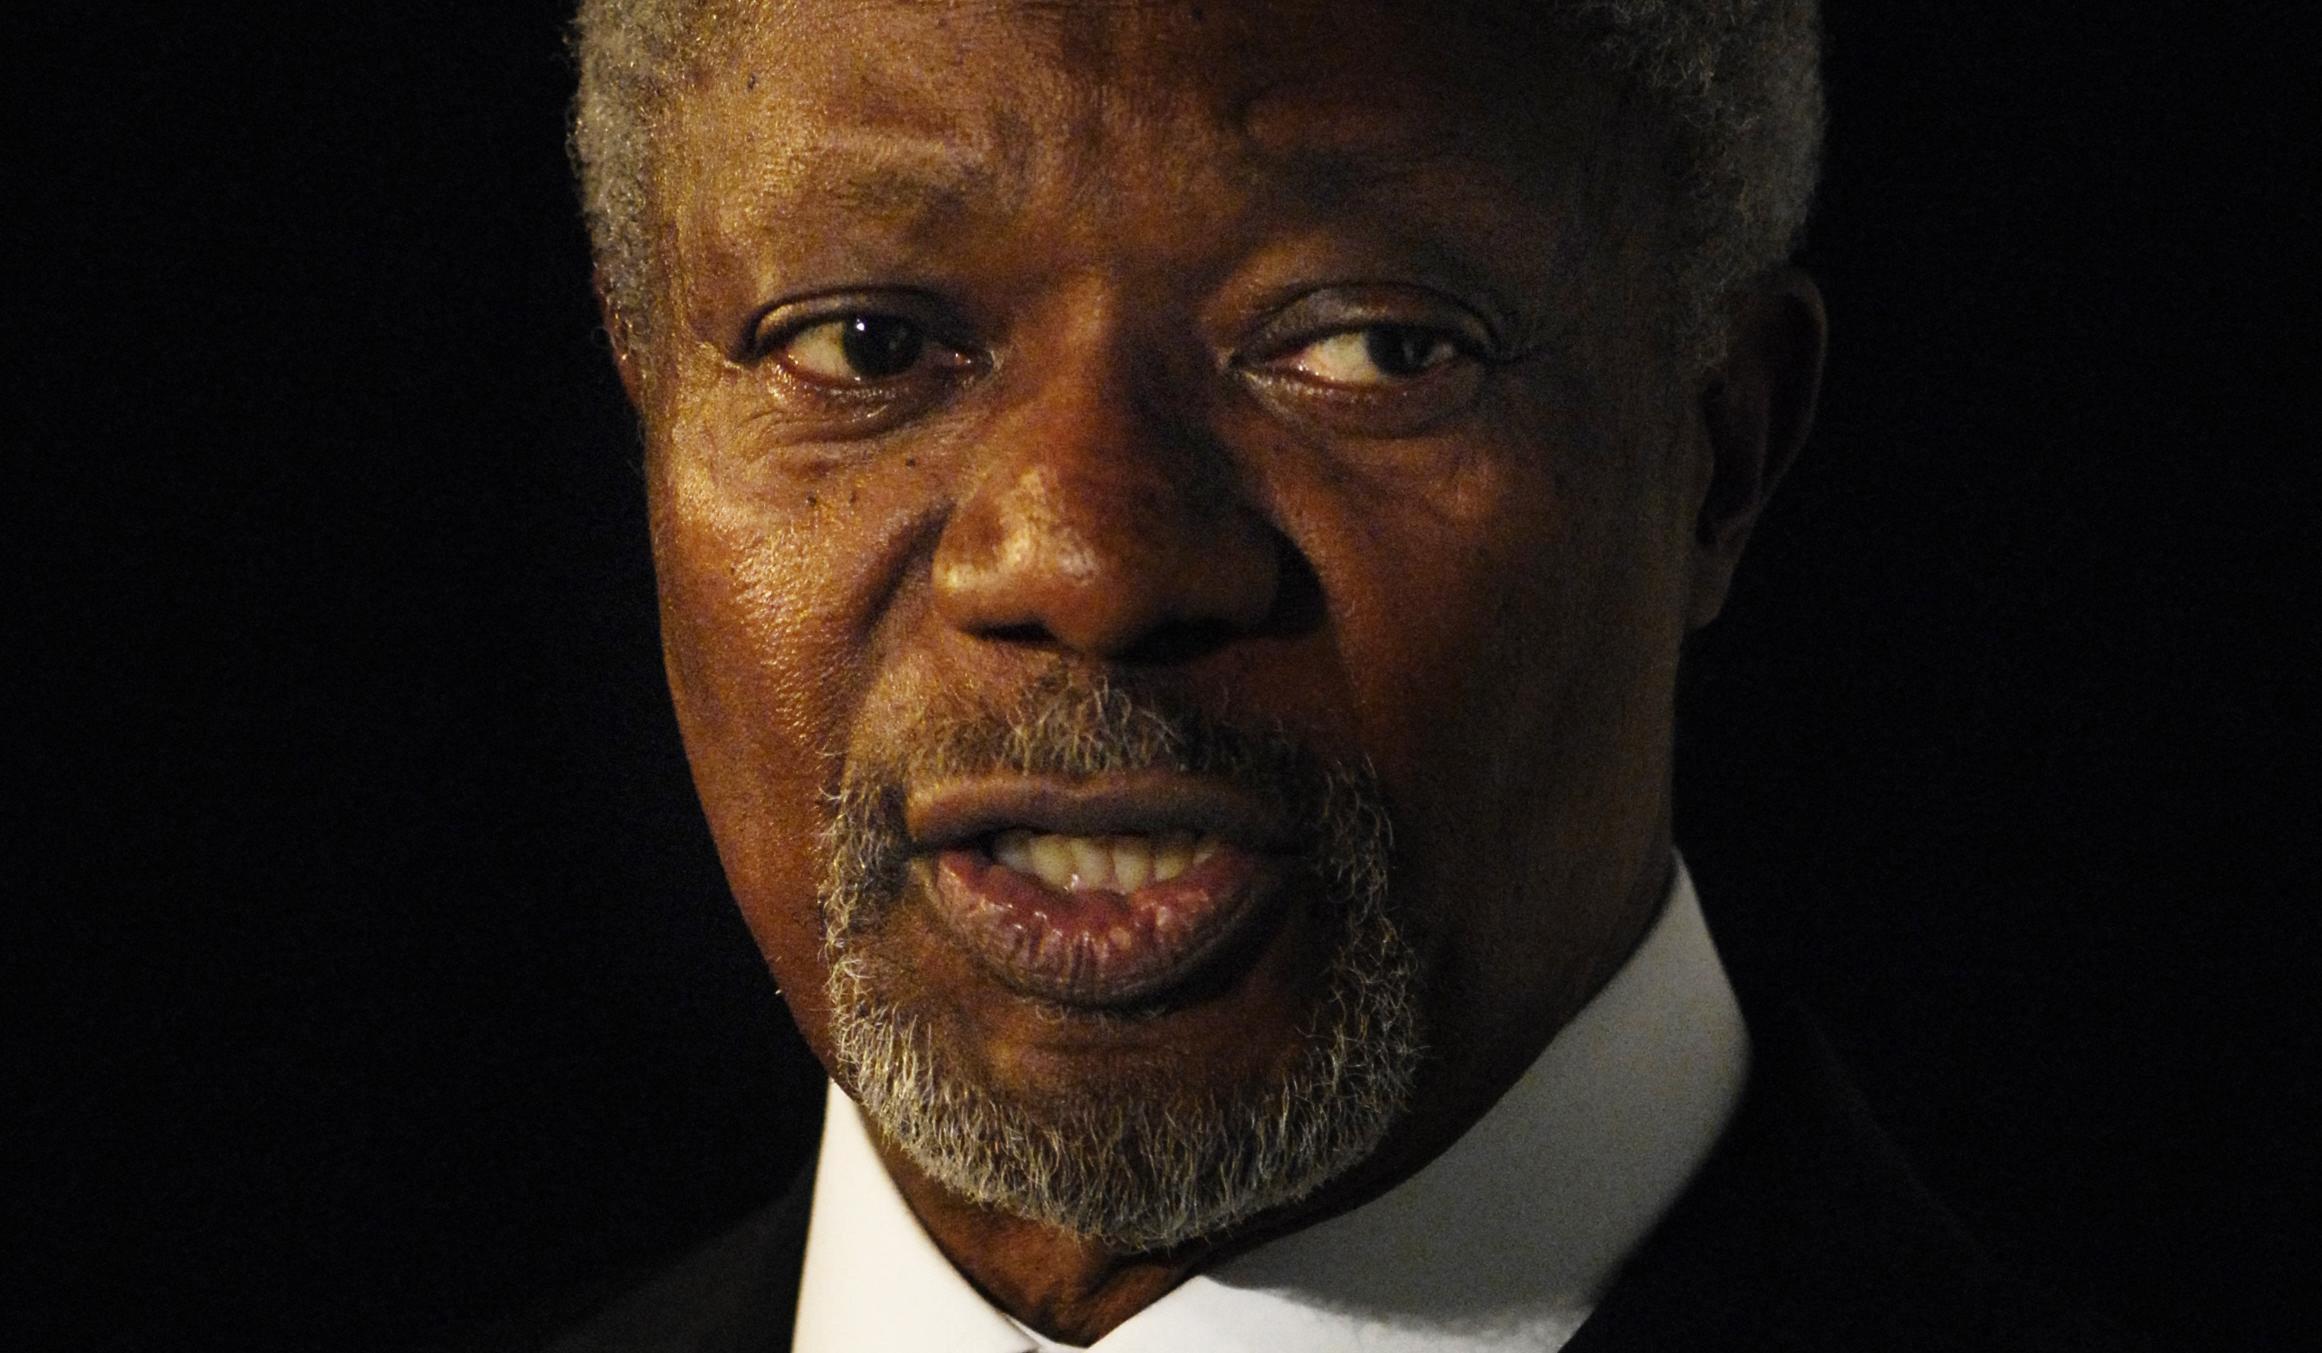 Kofi Annan, former UN Sec Gen, is dead : SDV